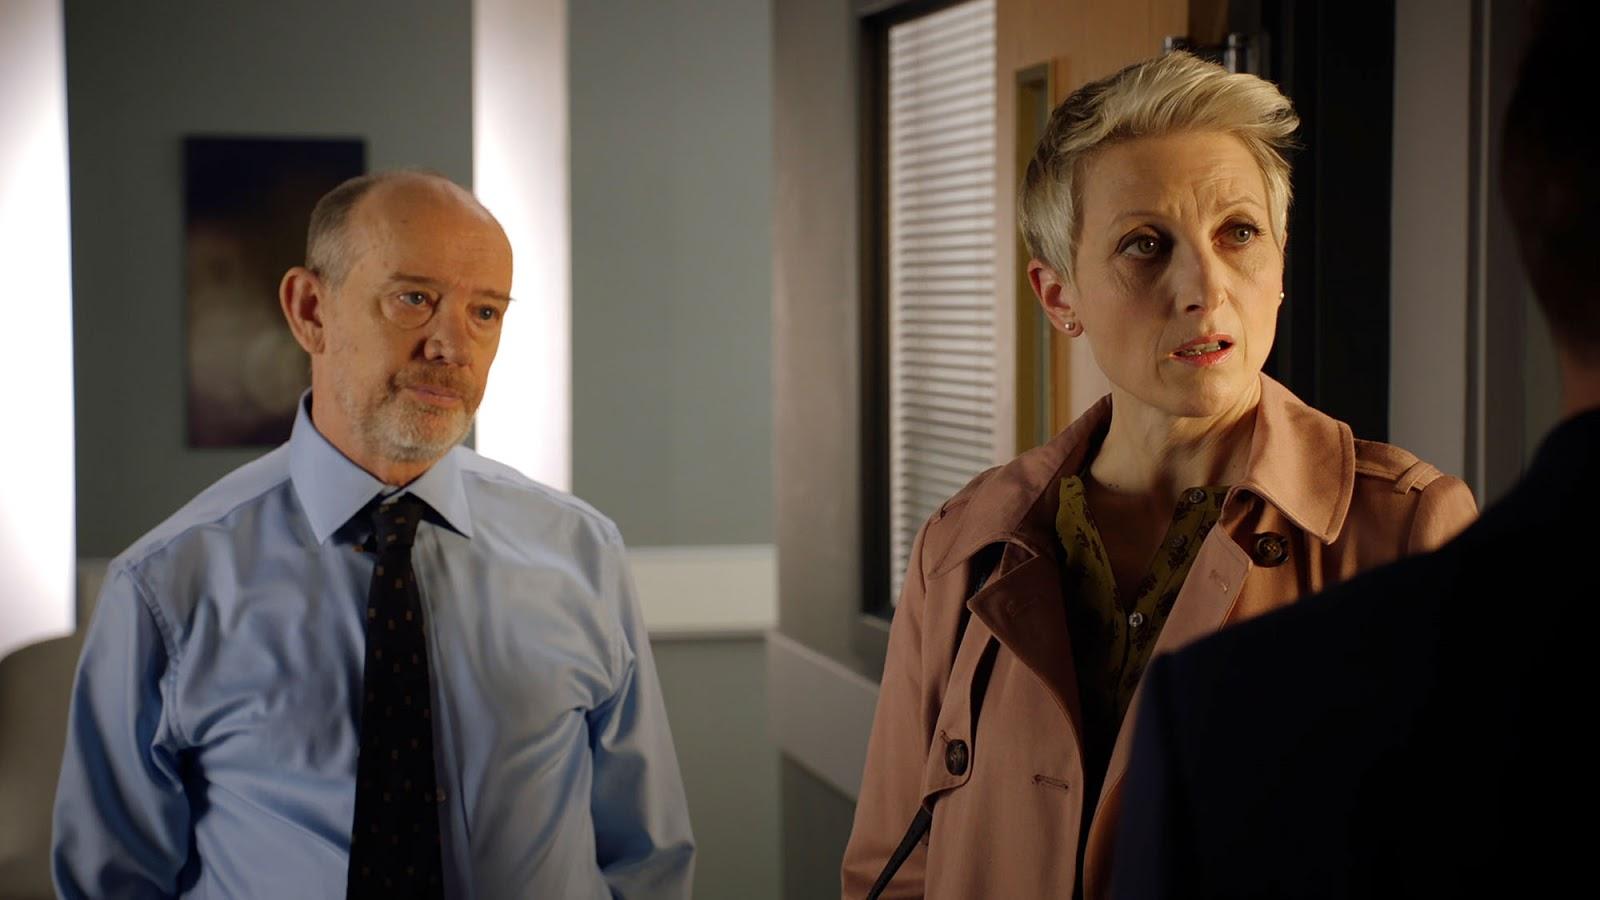 Holby City series 20 episode 26 'Fallen Idol'